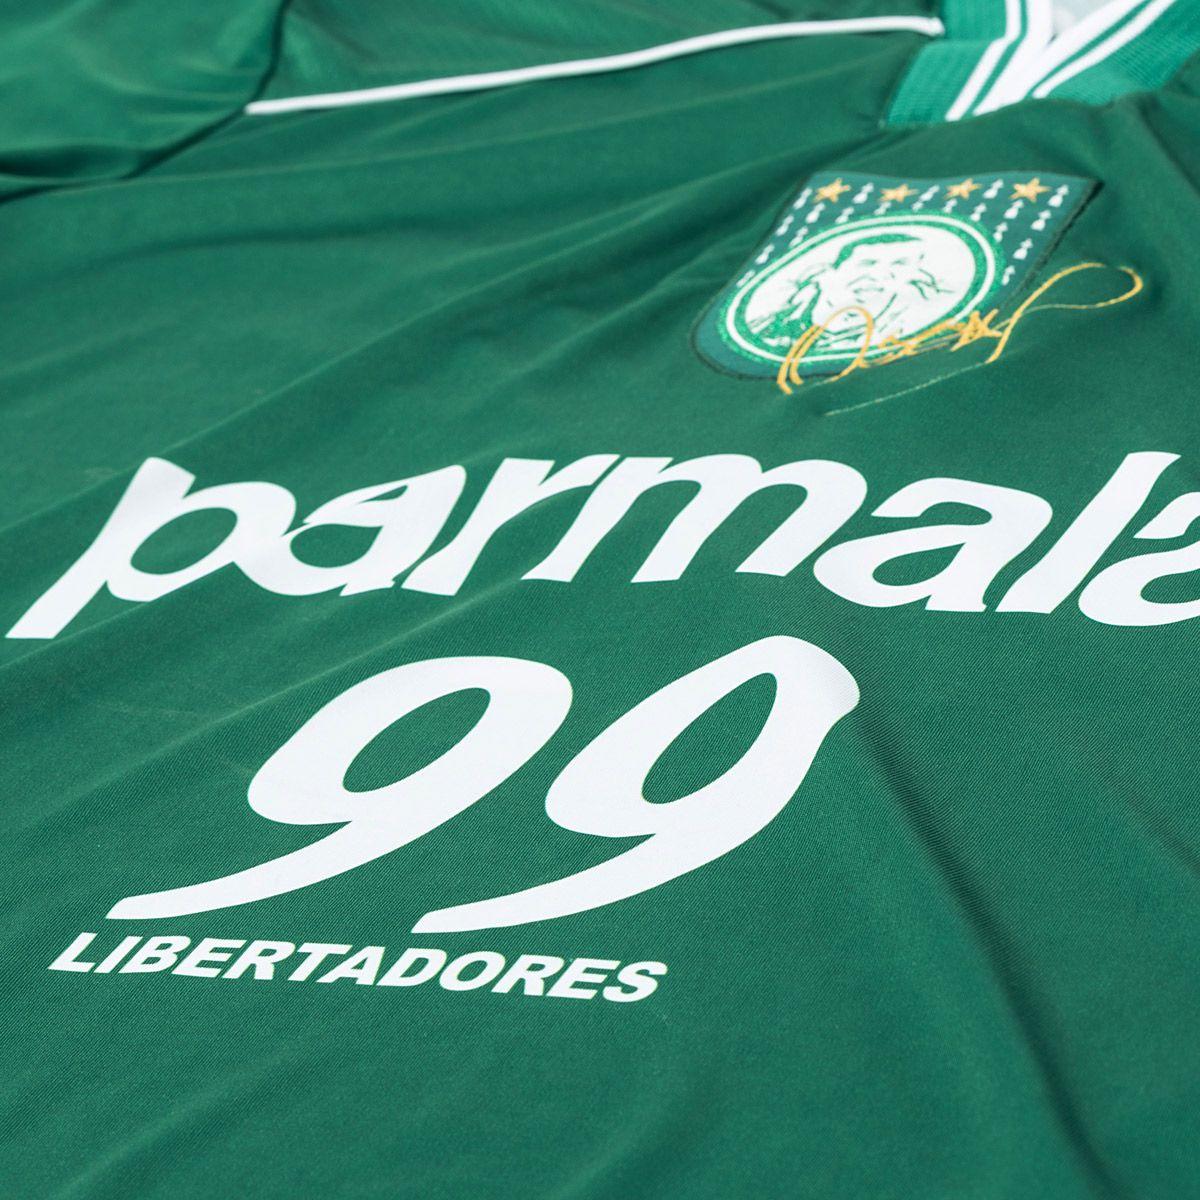 Camisa Palmeiras Retrô Gol Oséas Libertadores 99 Masculina